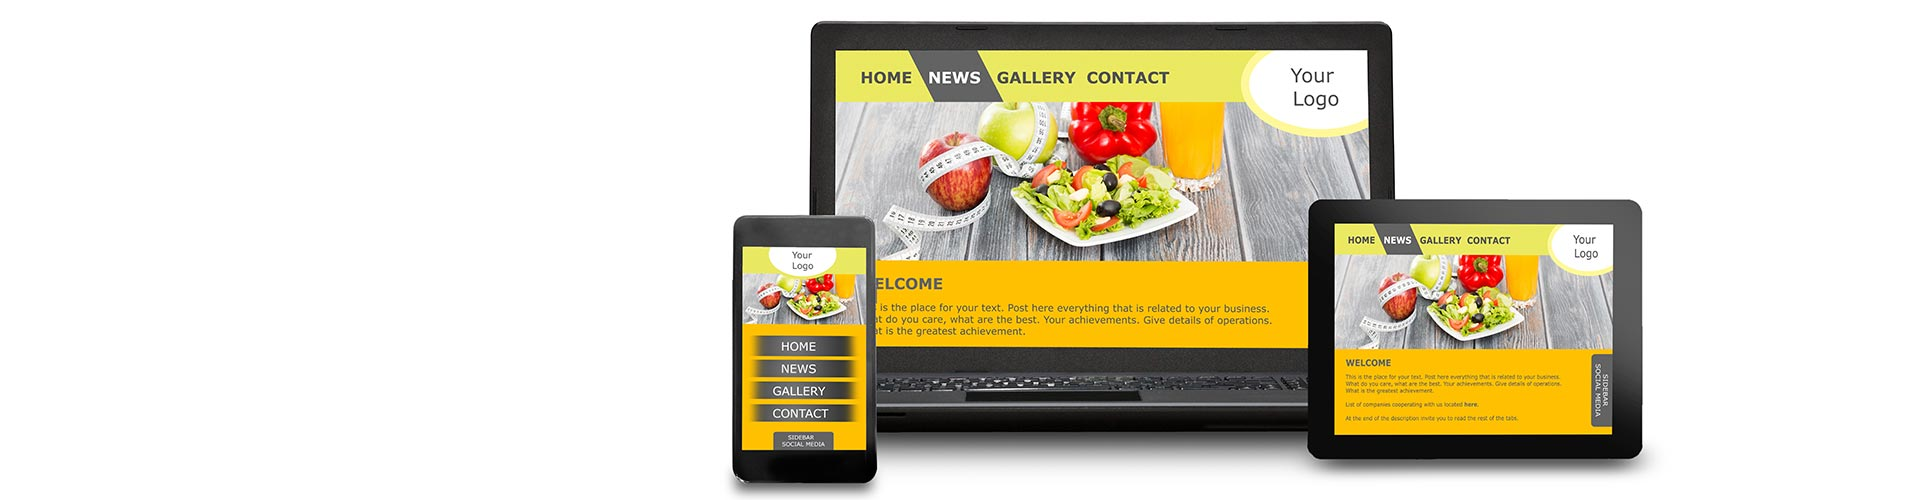 responsive web design plano